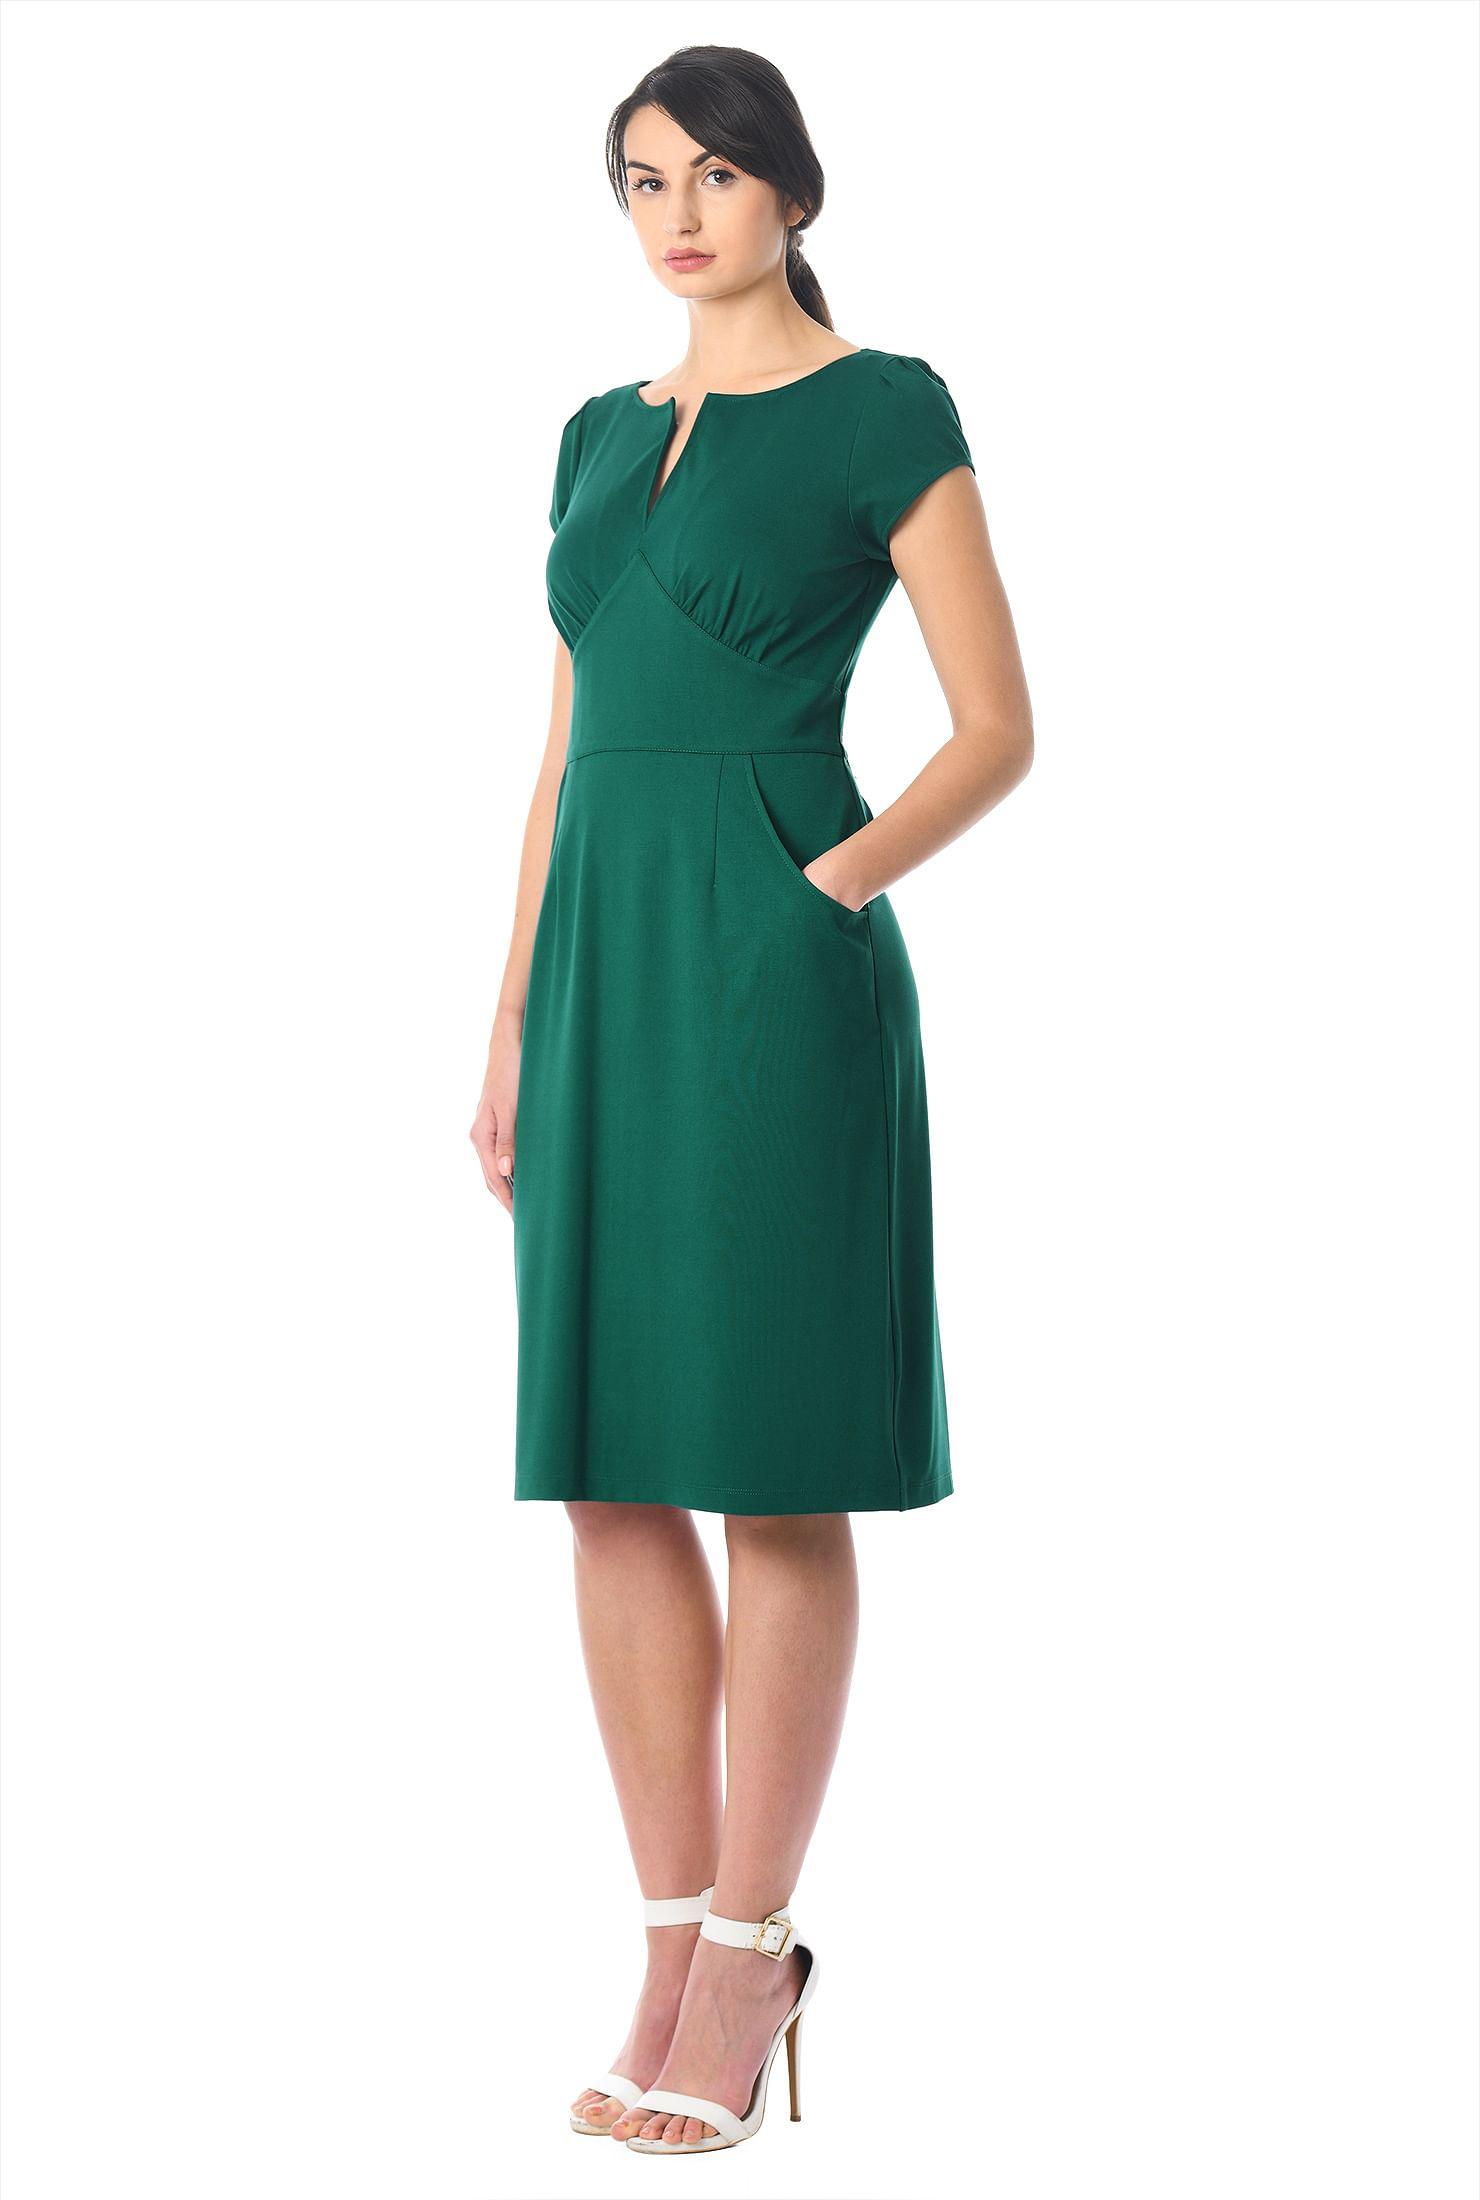 Ponte knit empire sheath dress